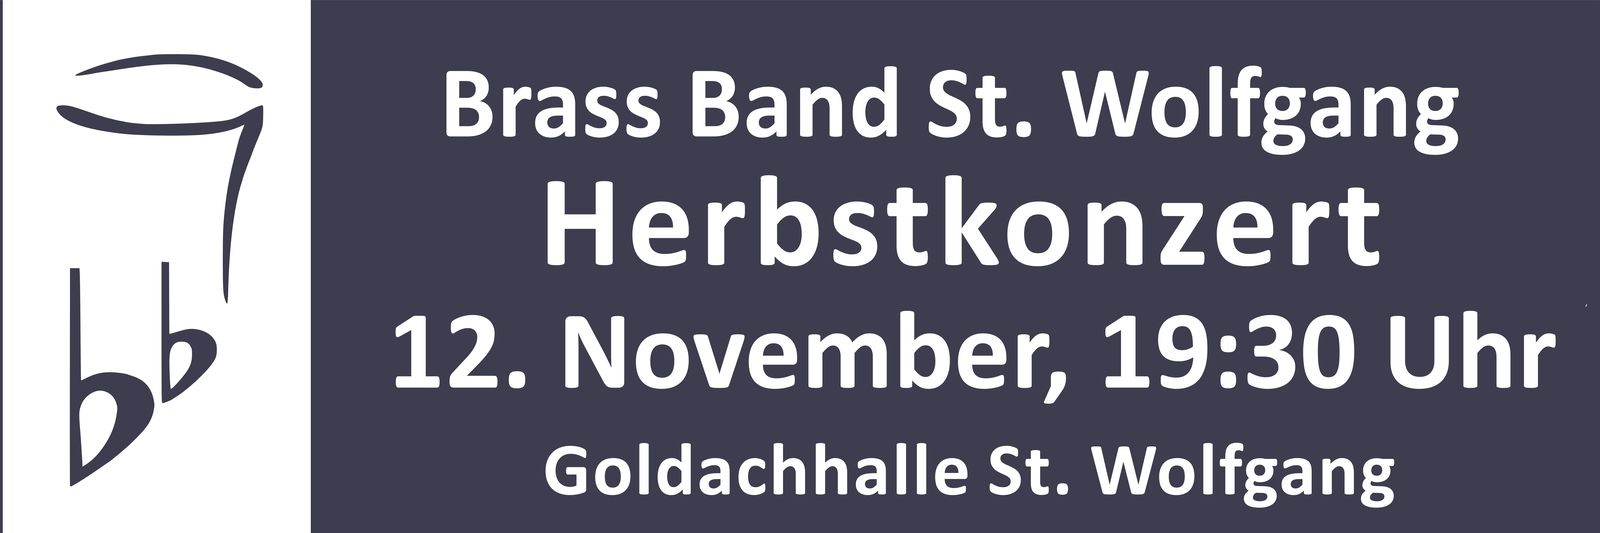 herbstkonzert_2016_banner